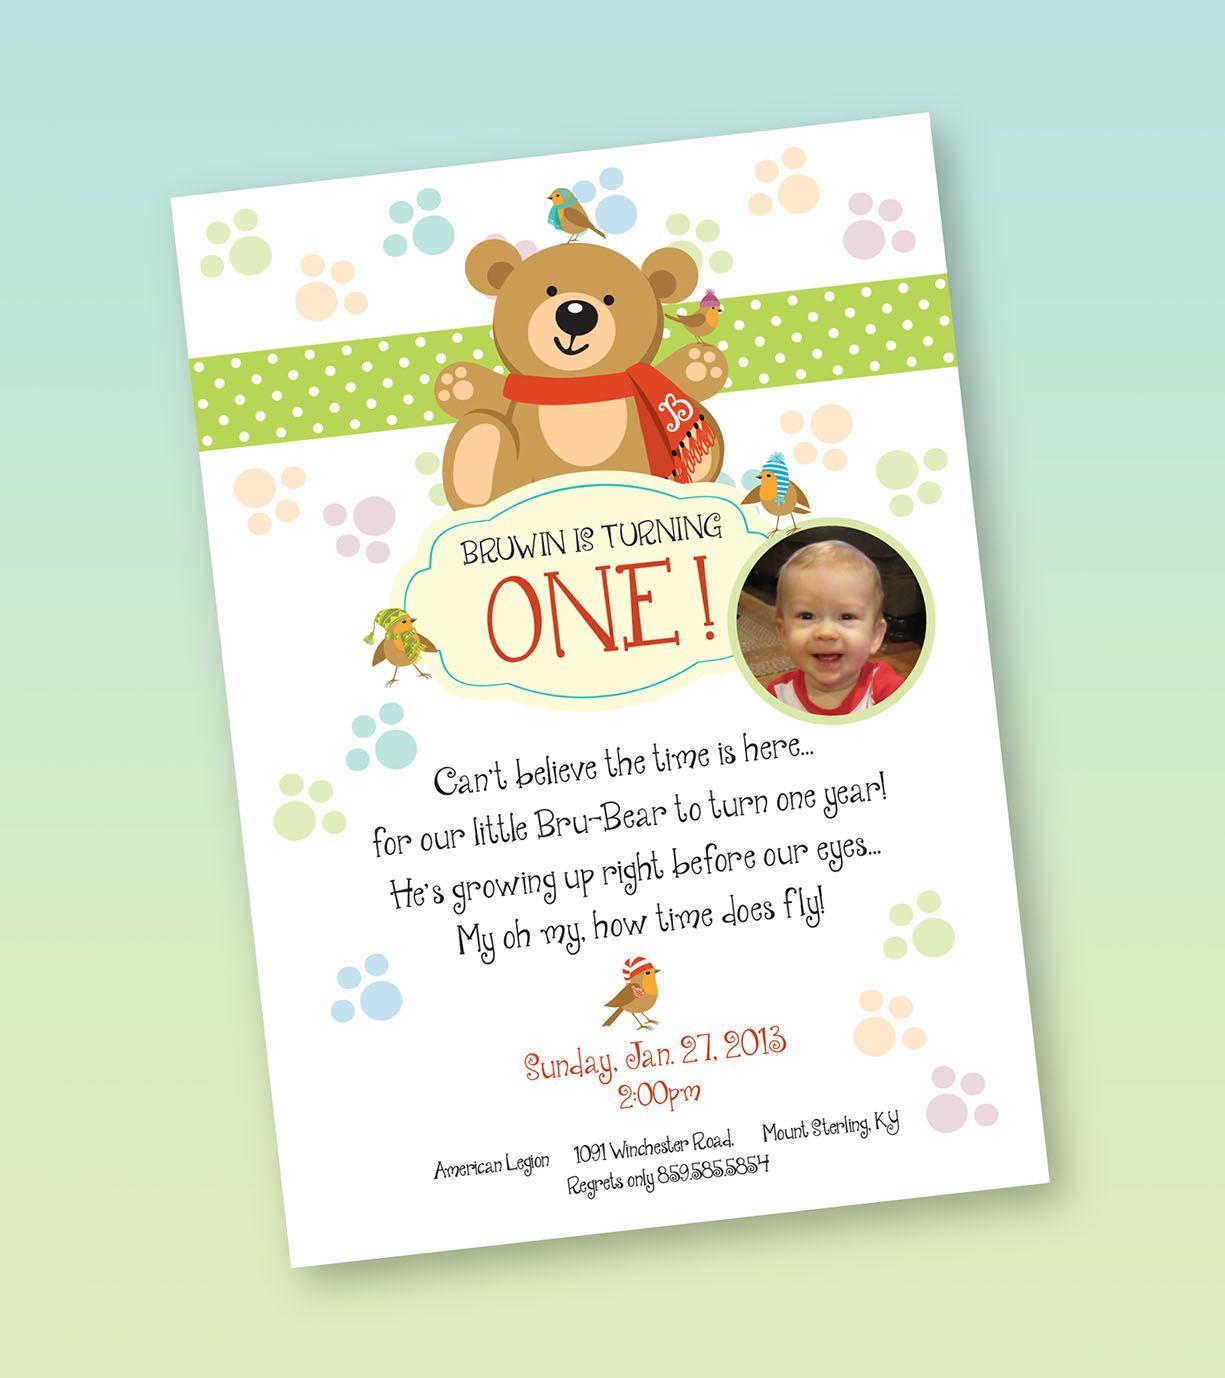 One Year Old Boy Birthday Invitation Winter Teddy Bear Theme Birthday Invitations Boy Birthday Invitations Minnie Mouse Birthday Invitations